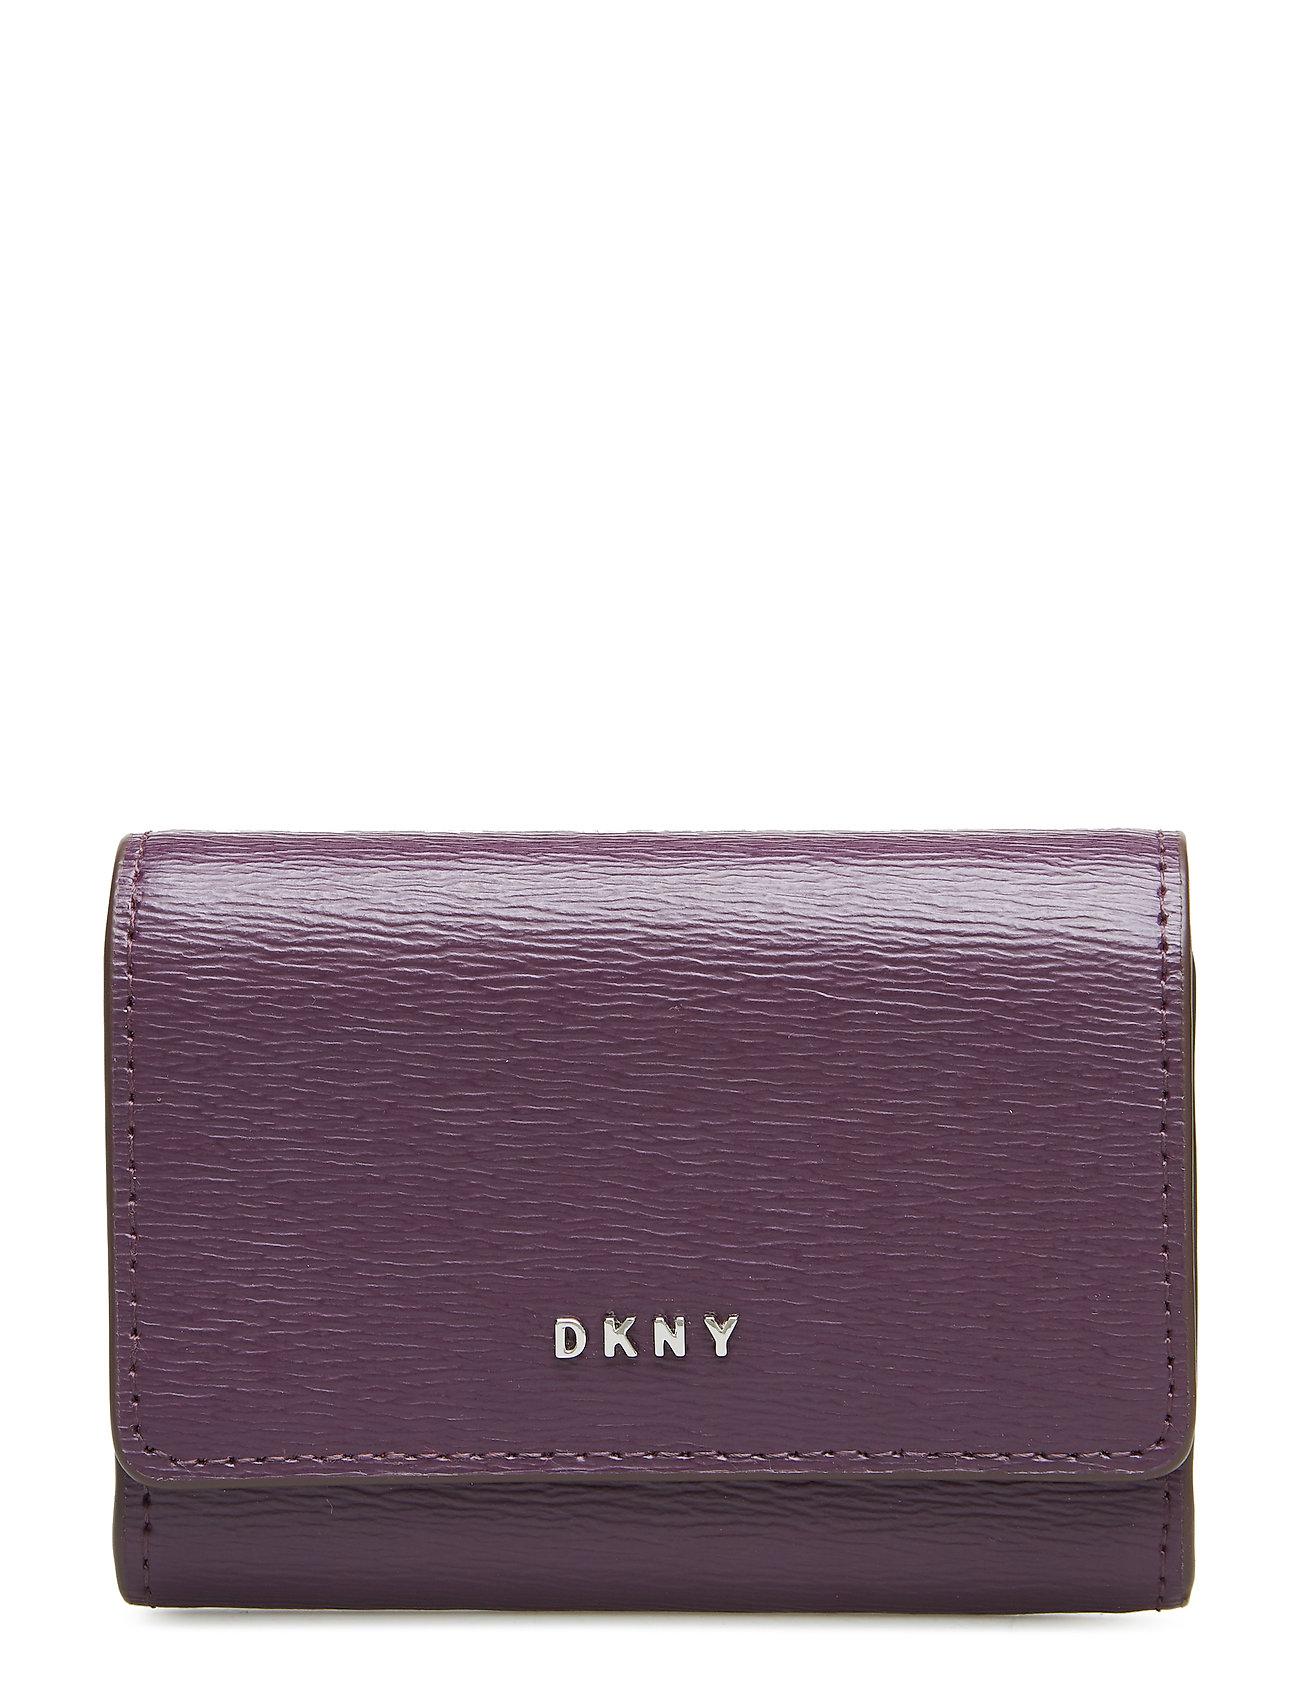 DKNY Bags BRYANT-CARD CASE-ID